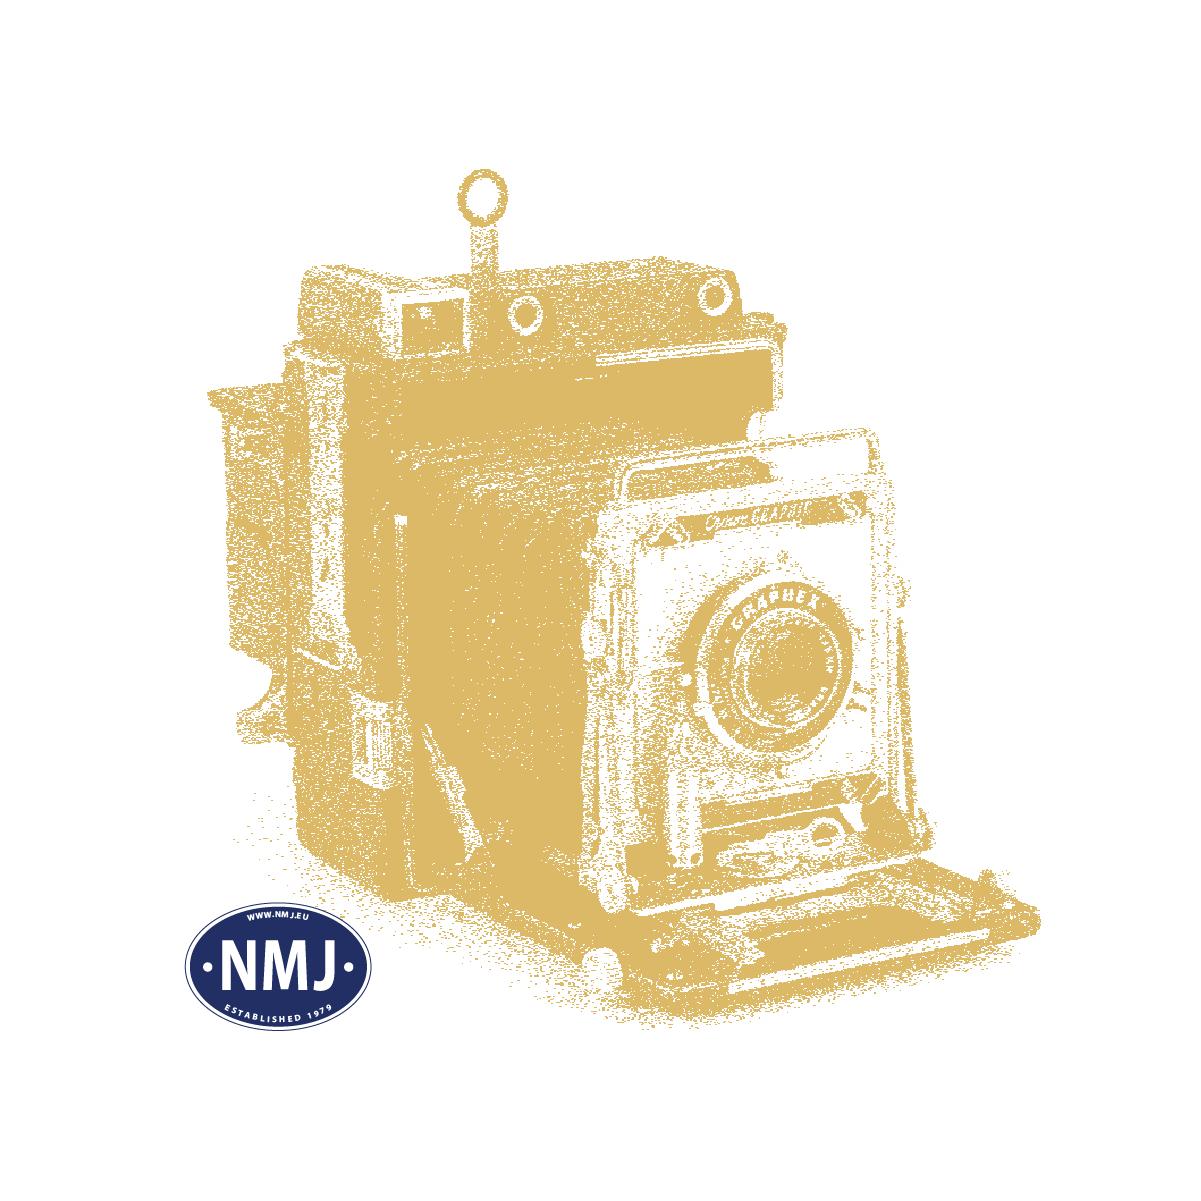 NMJ Superline NSB Tl3 16542, 0-Scala